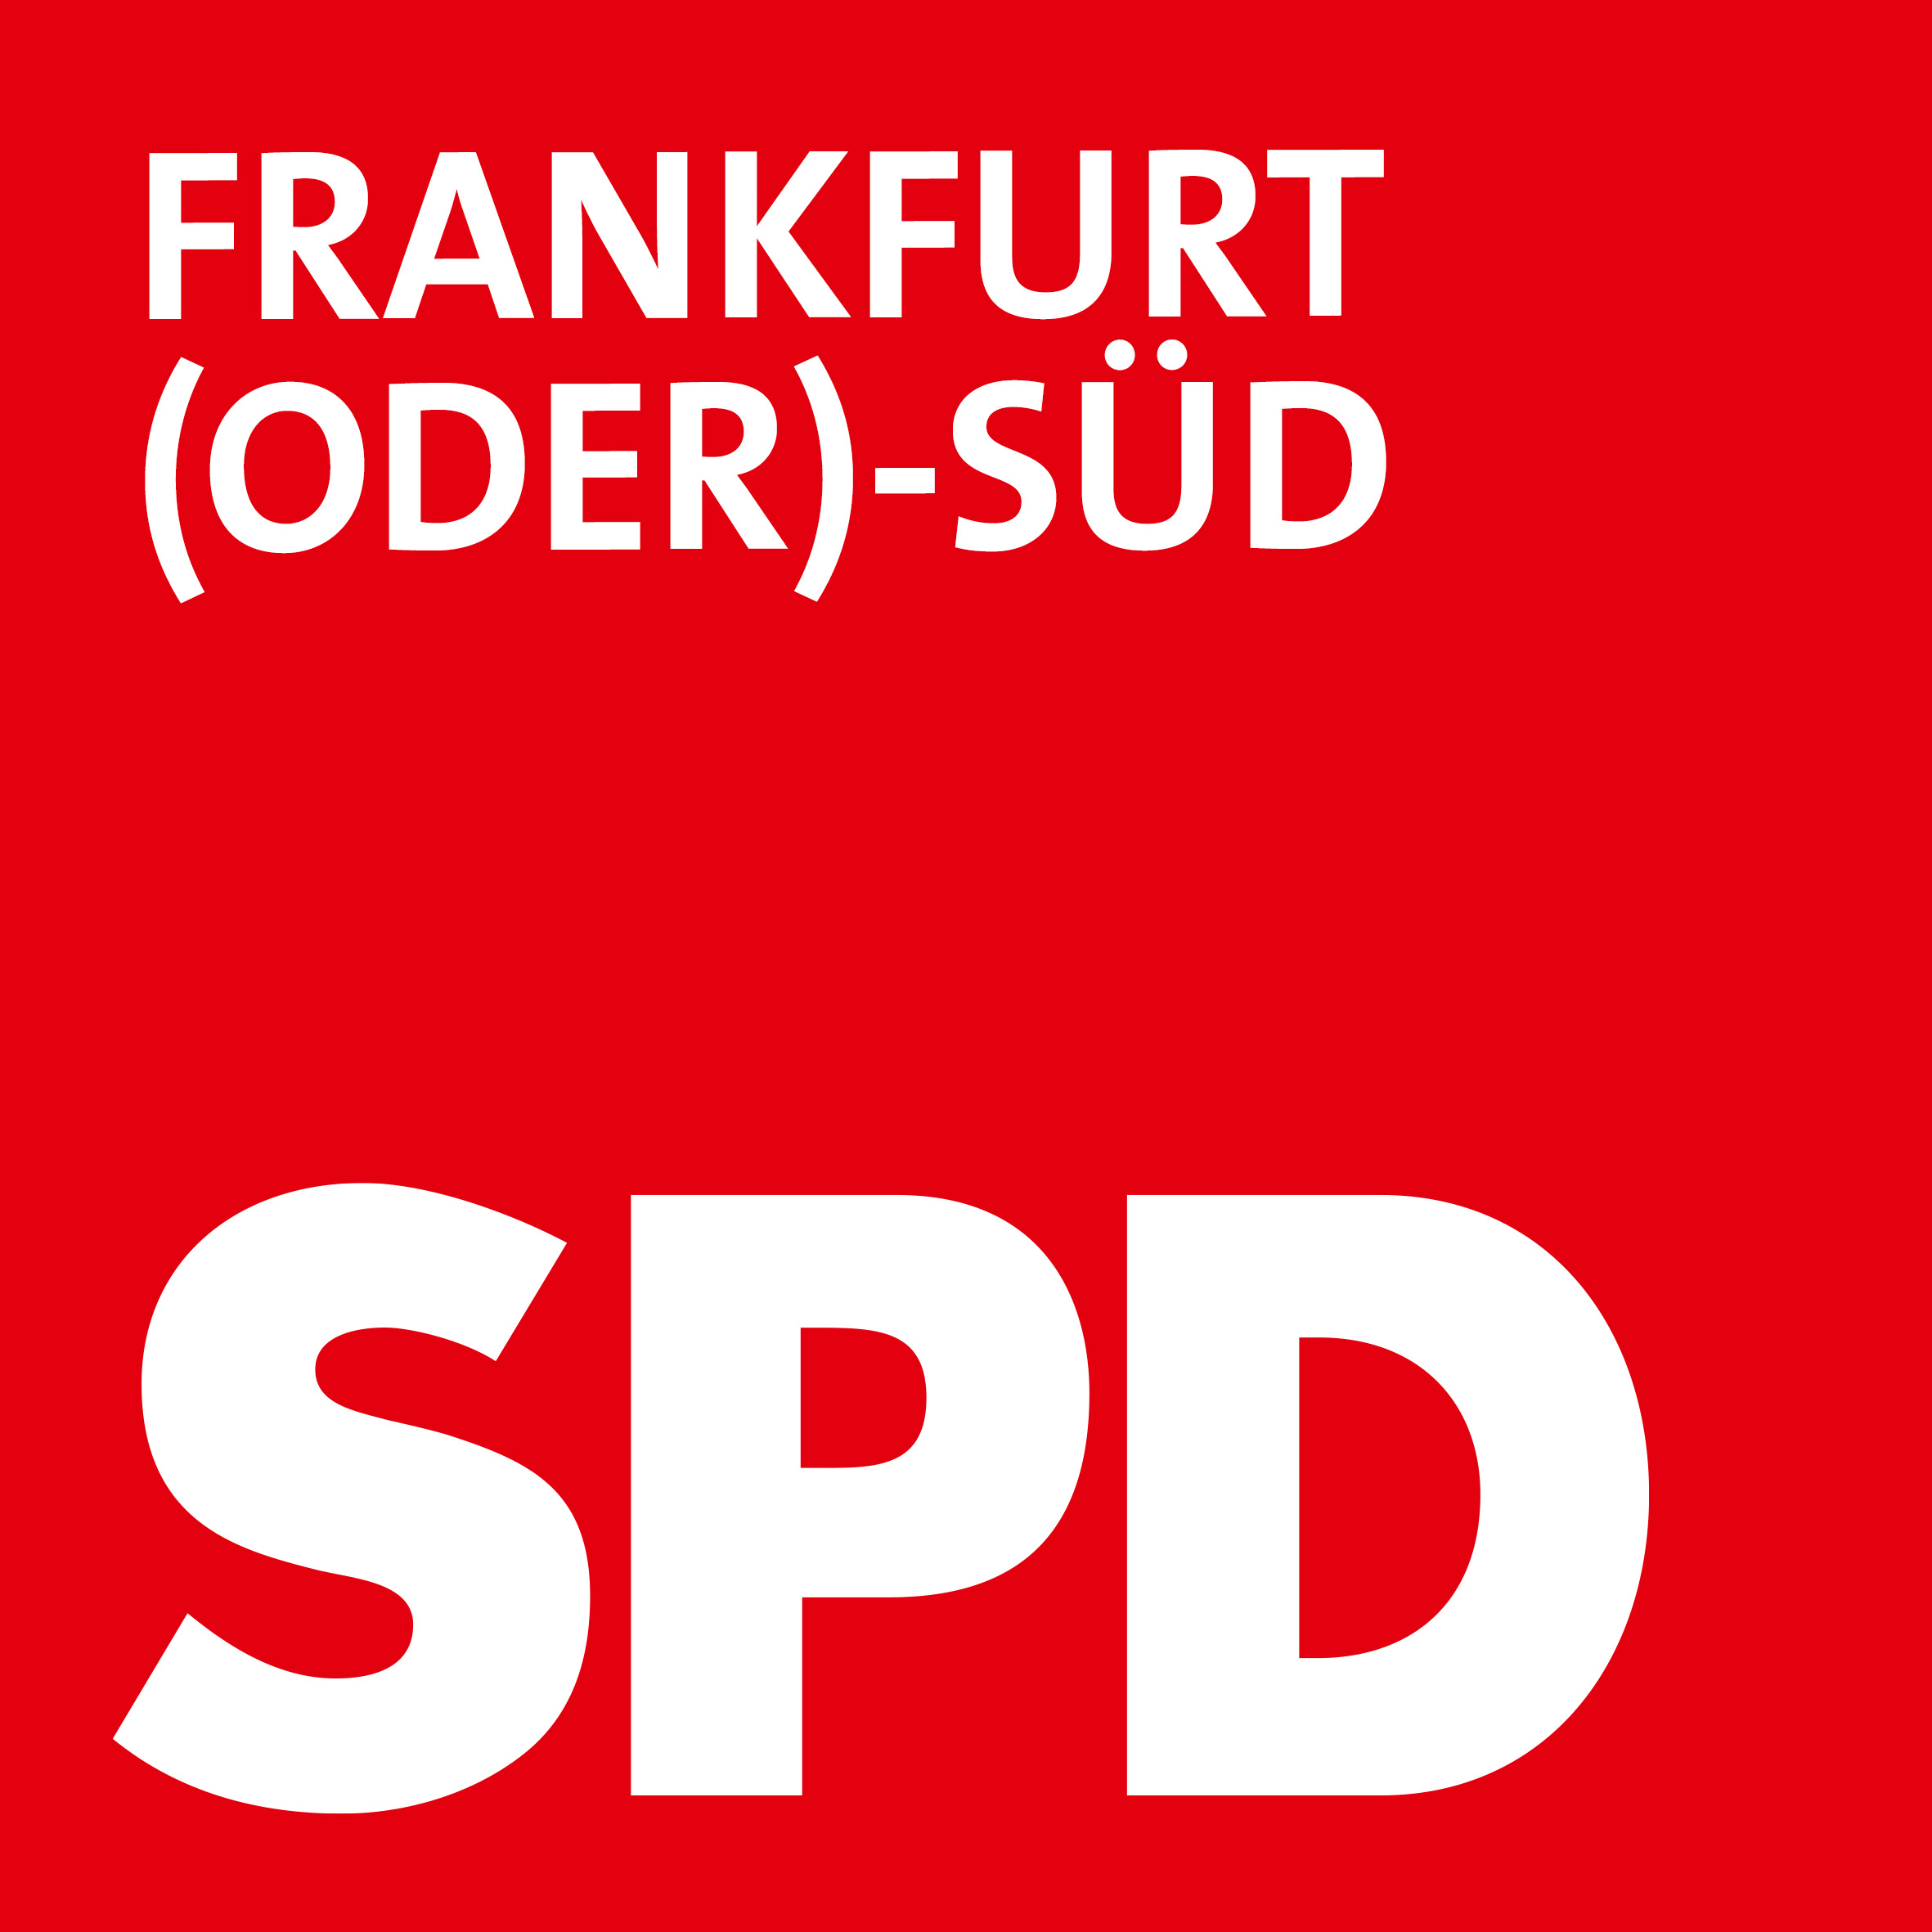 SPD Frankfurt (Oder)-Süd